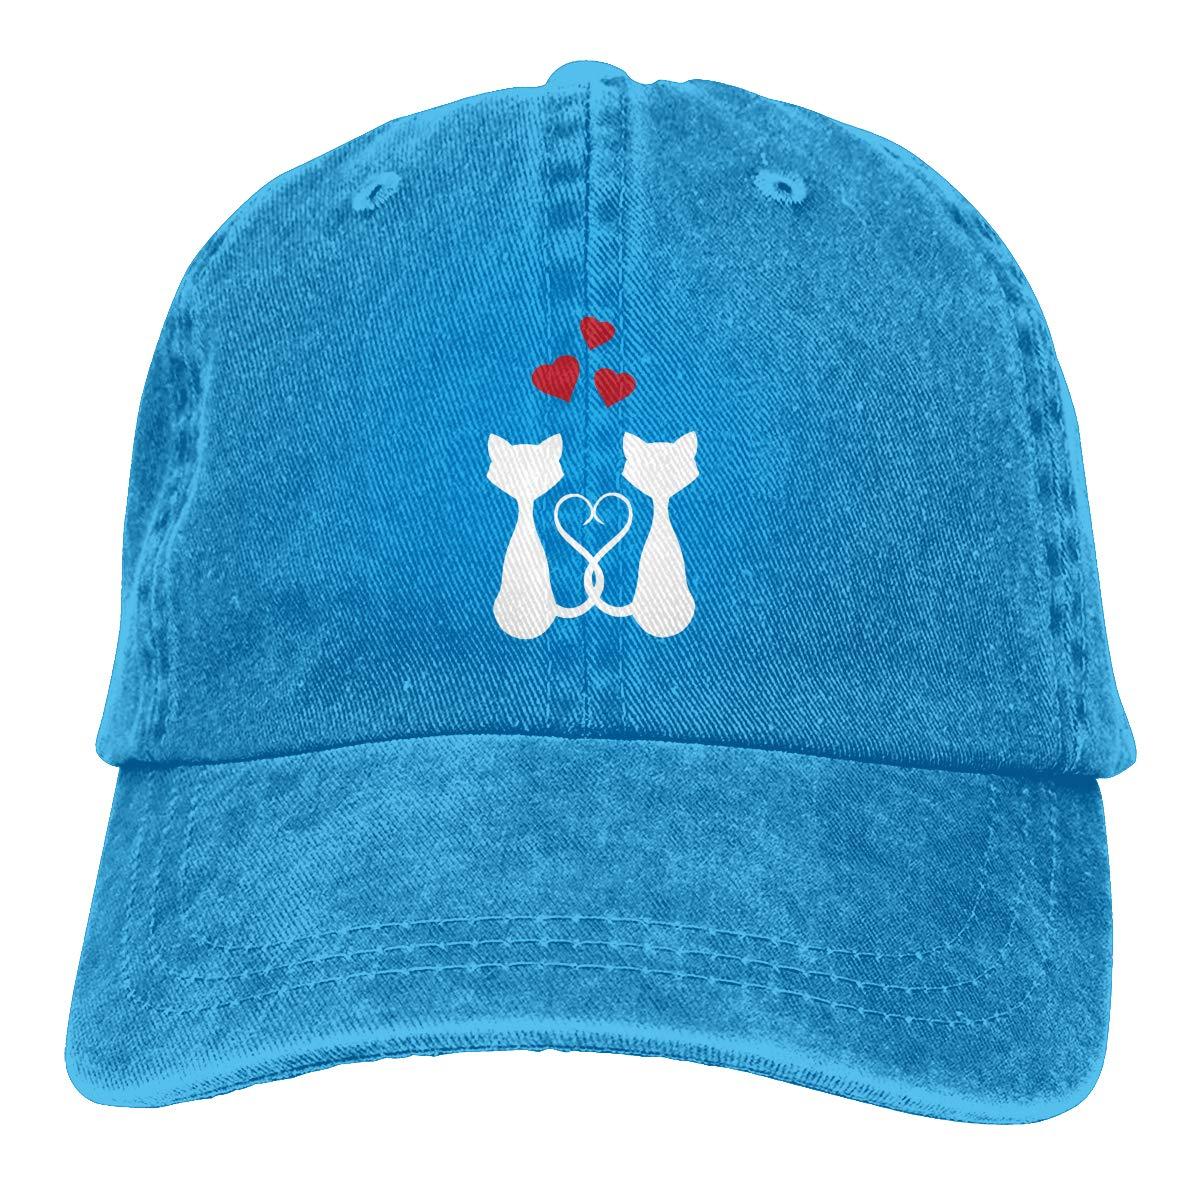 Hearts Cat Fashion Adjustable Cowboy Cap Baseball Cap for Women and Men